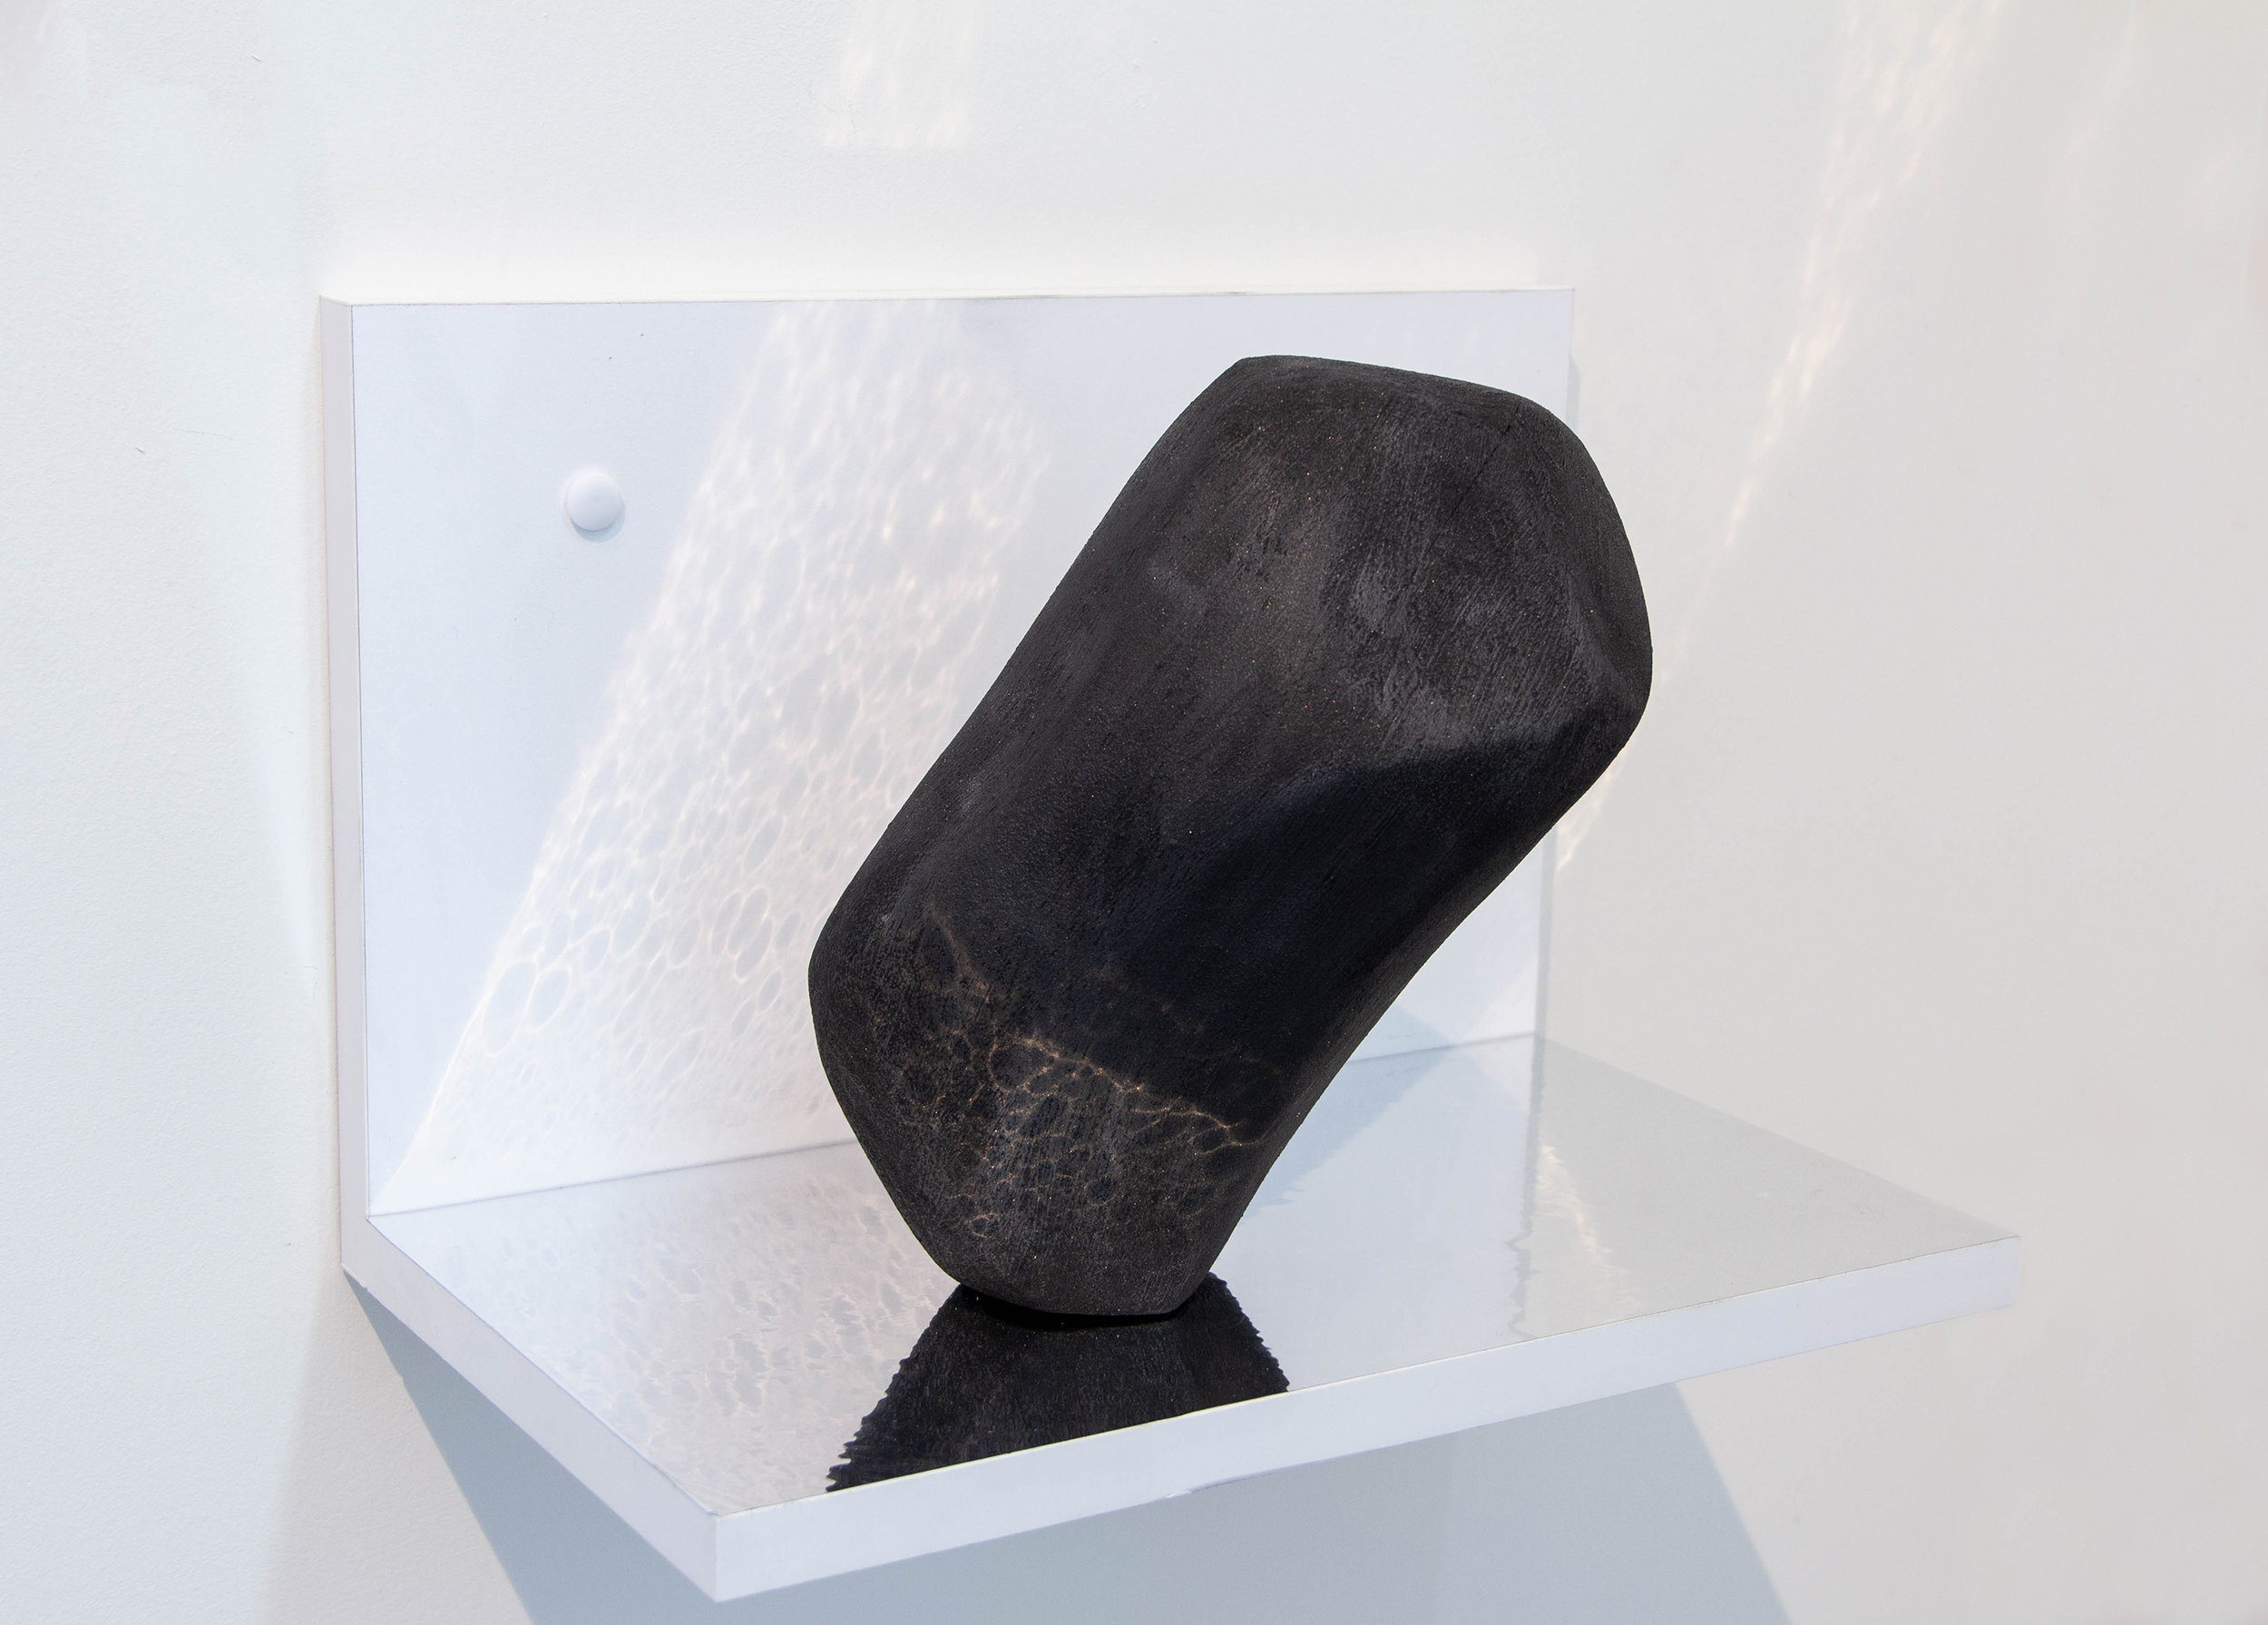 sculpture_SpaceObjectwithShelf.jpg